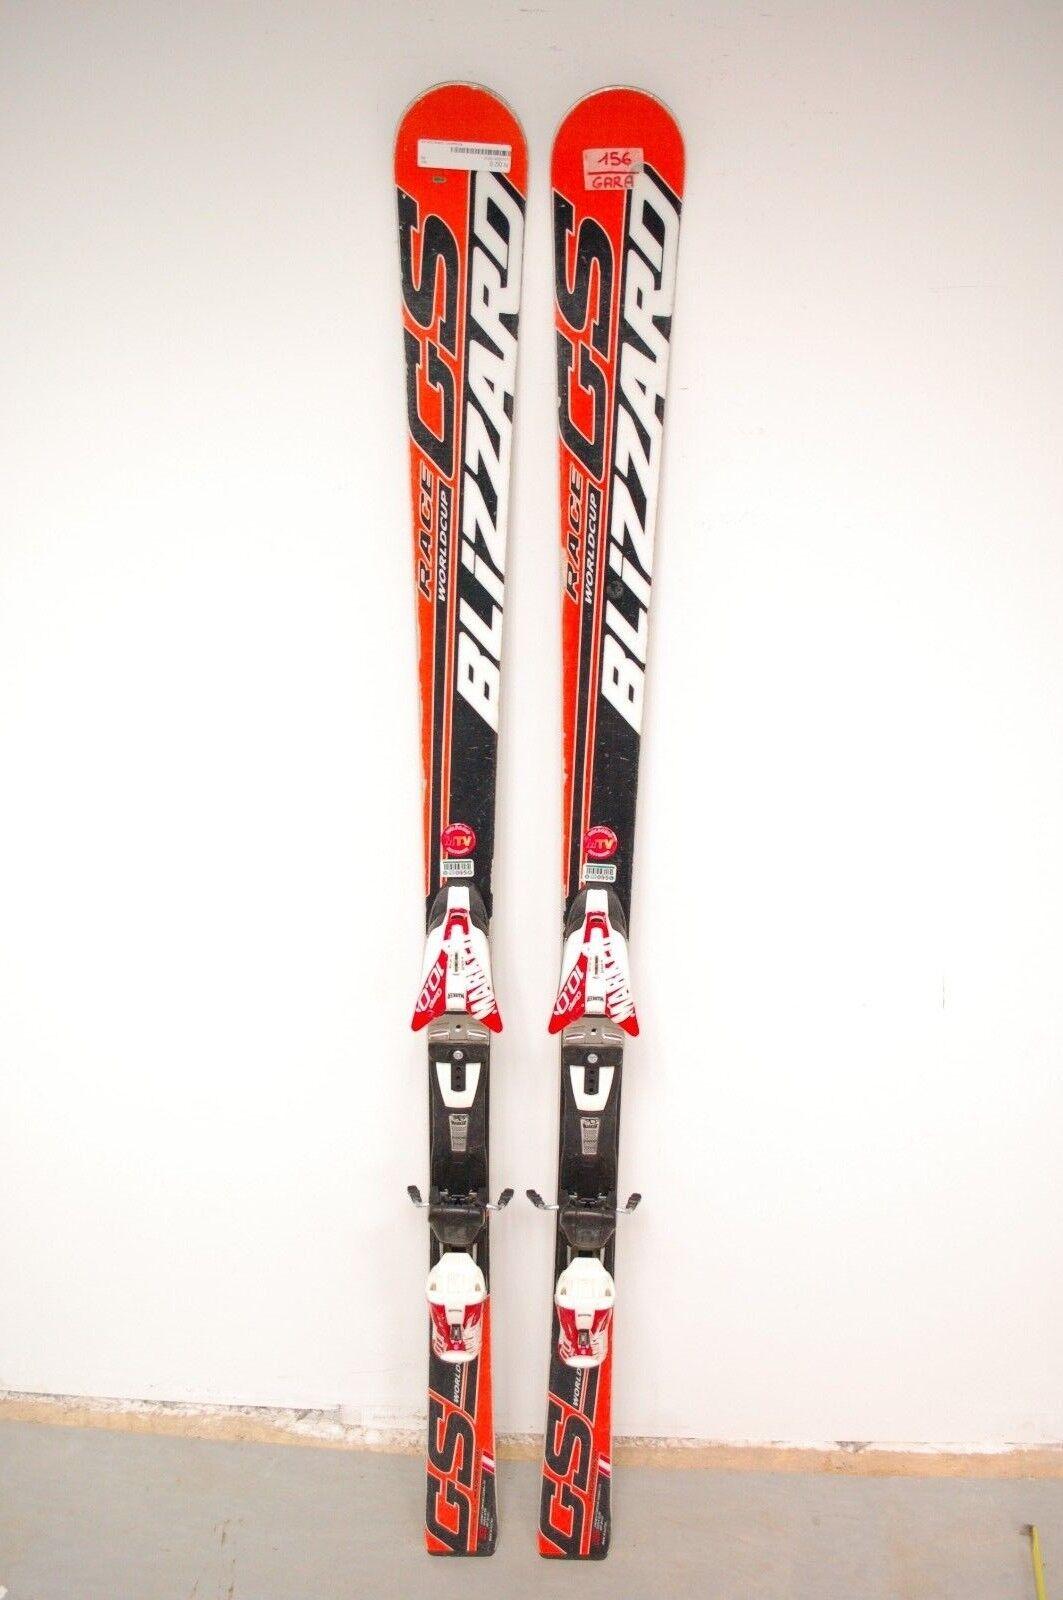 Blizzard Race GS Magnesium World Cup 156 cm Ski + Marker Comp 10.0 Bindings